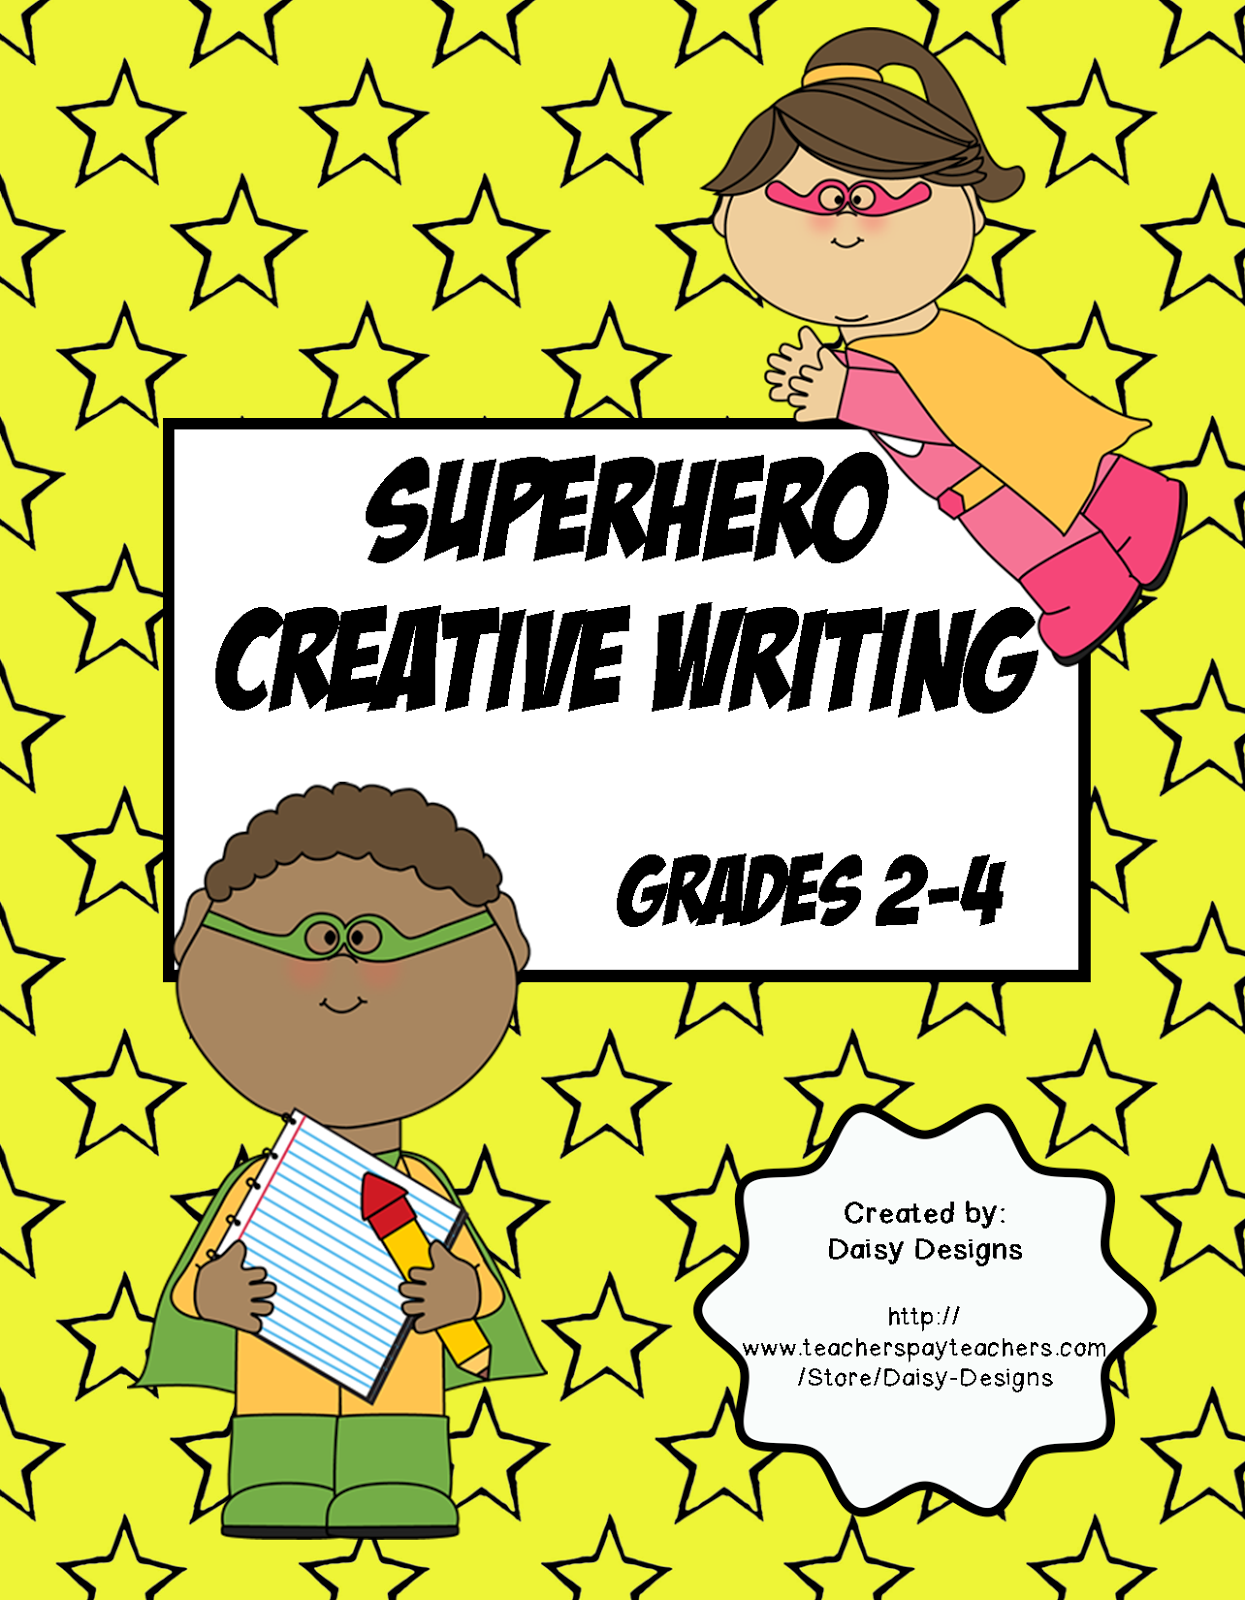 Daisy Designs Superhero Creative Writing